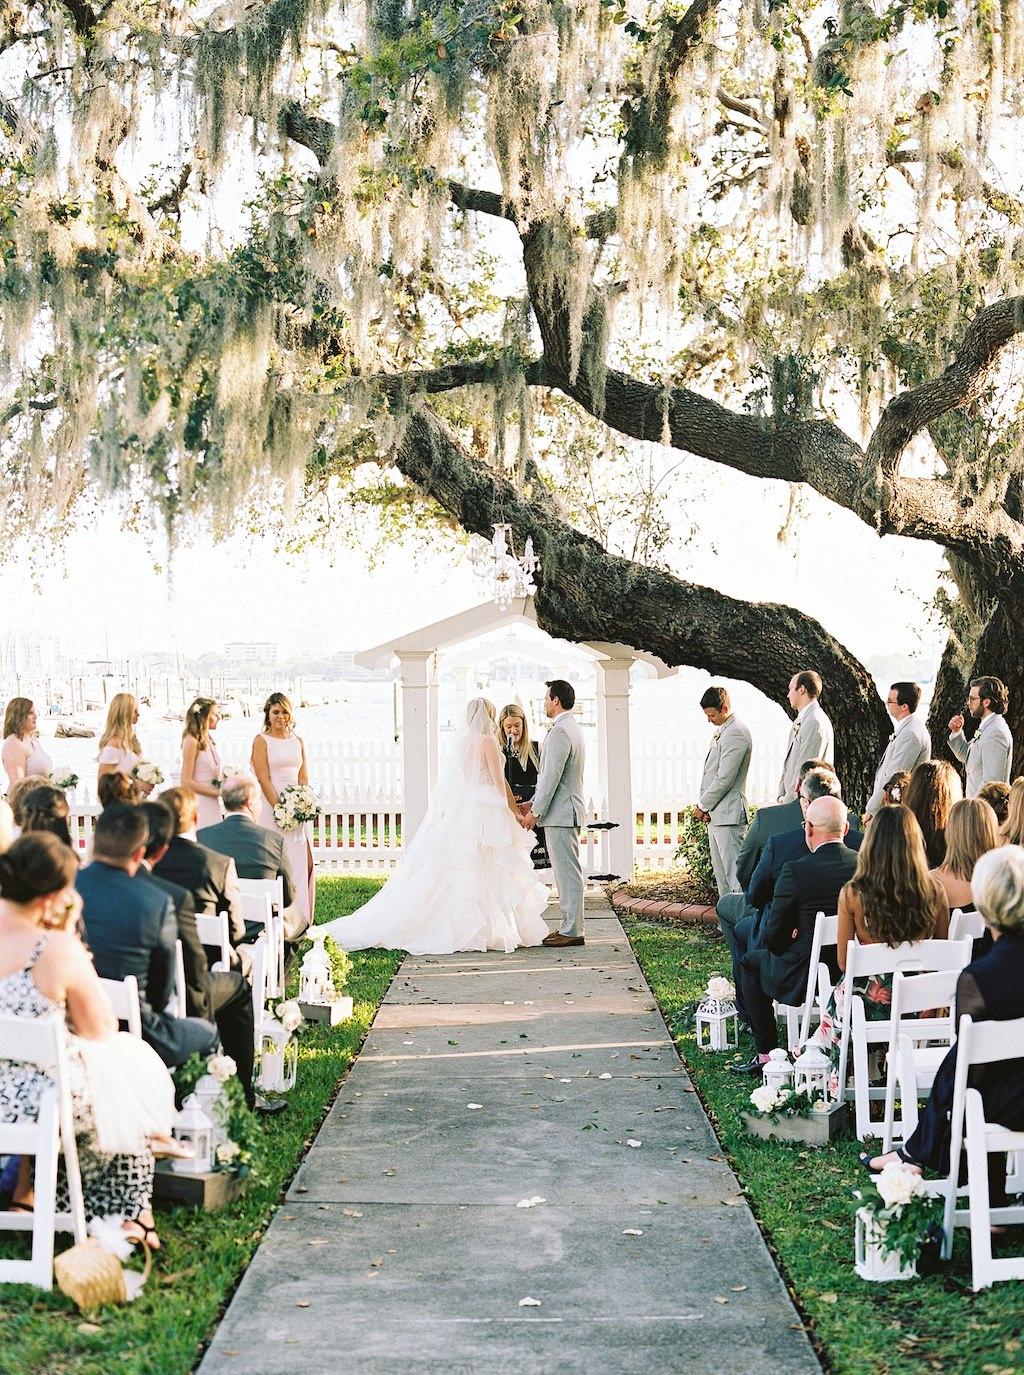 Florida Bride and Groom Waterfront Outdoor Wedding Portrait Exchanging Vows | Florida Wedding Venue Palmetto Riverside Bed and Breakfast